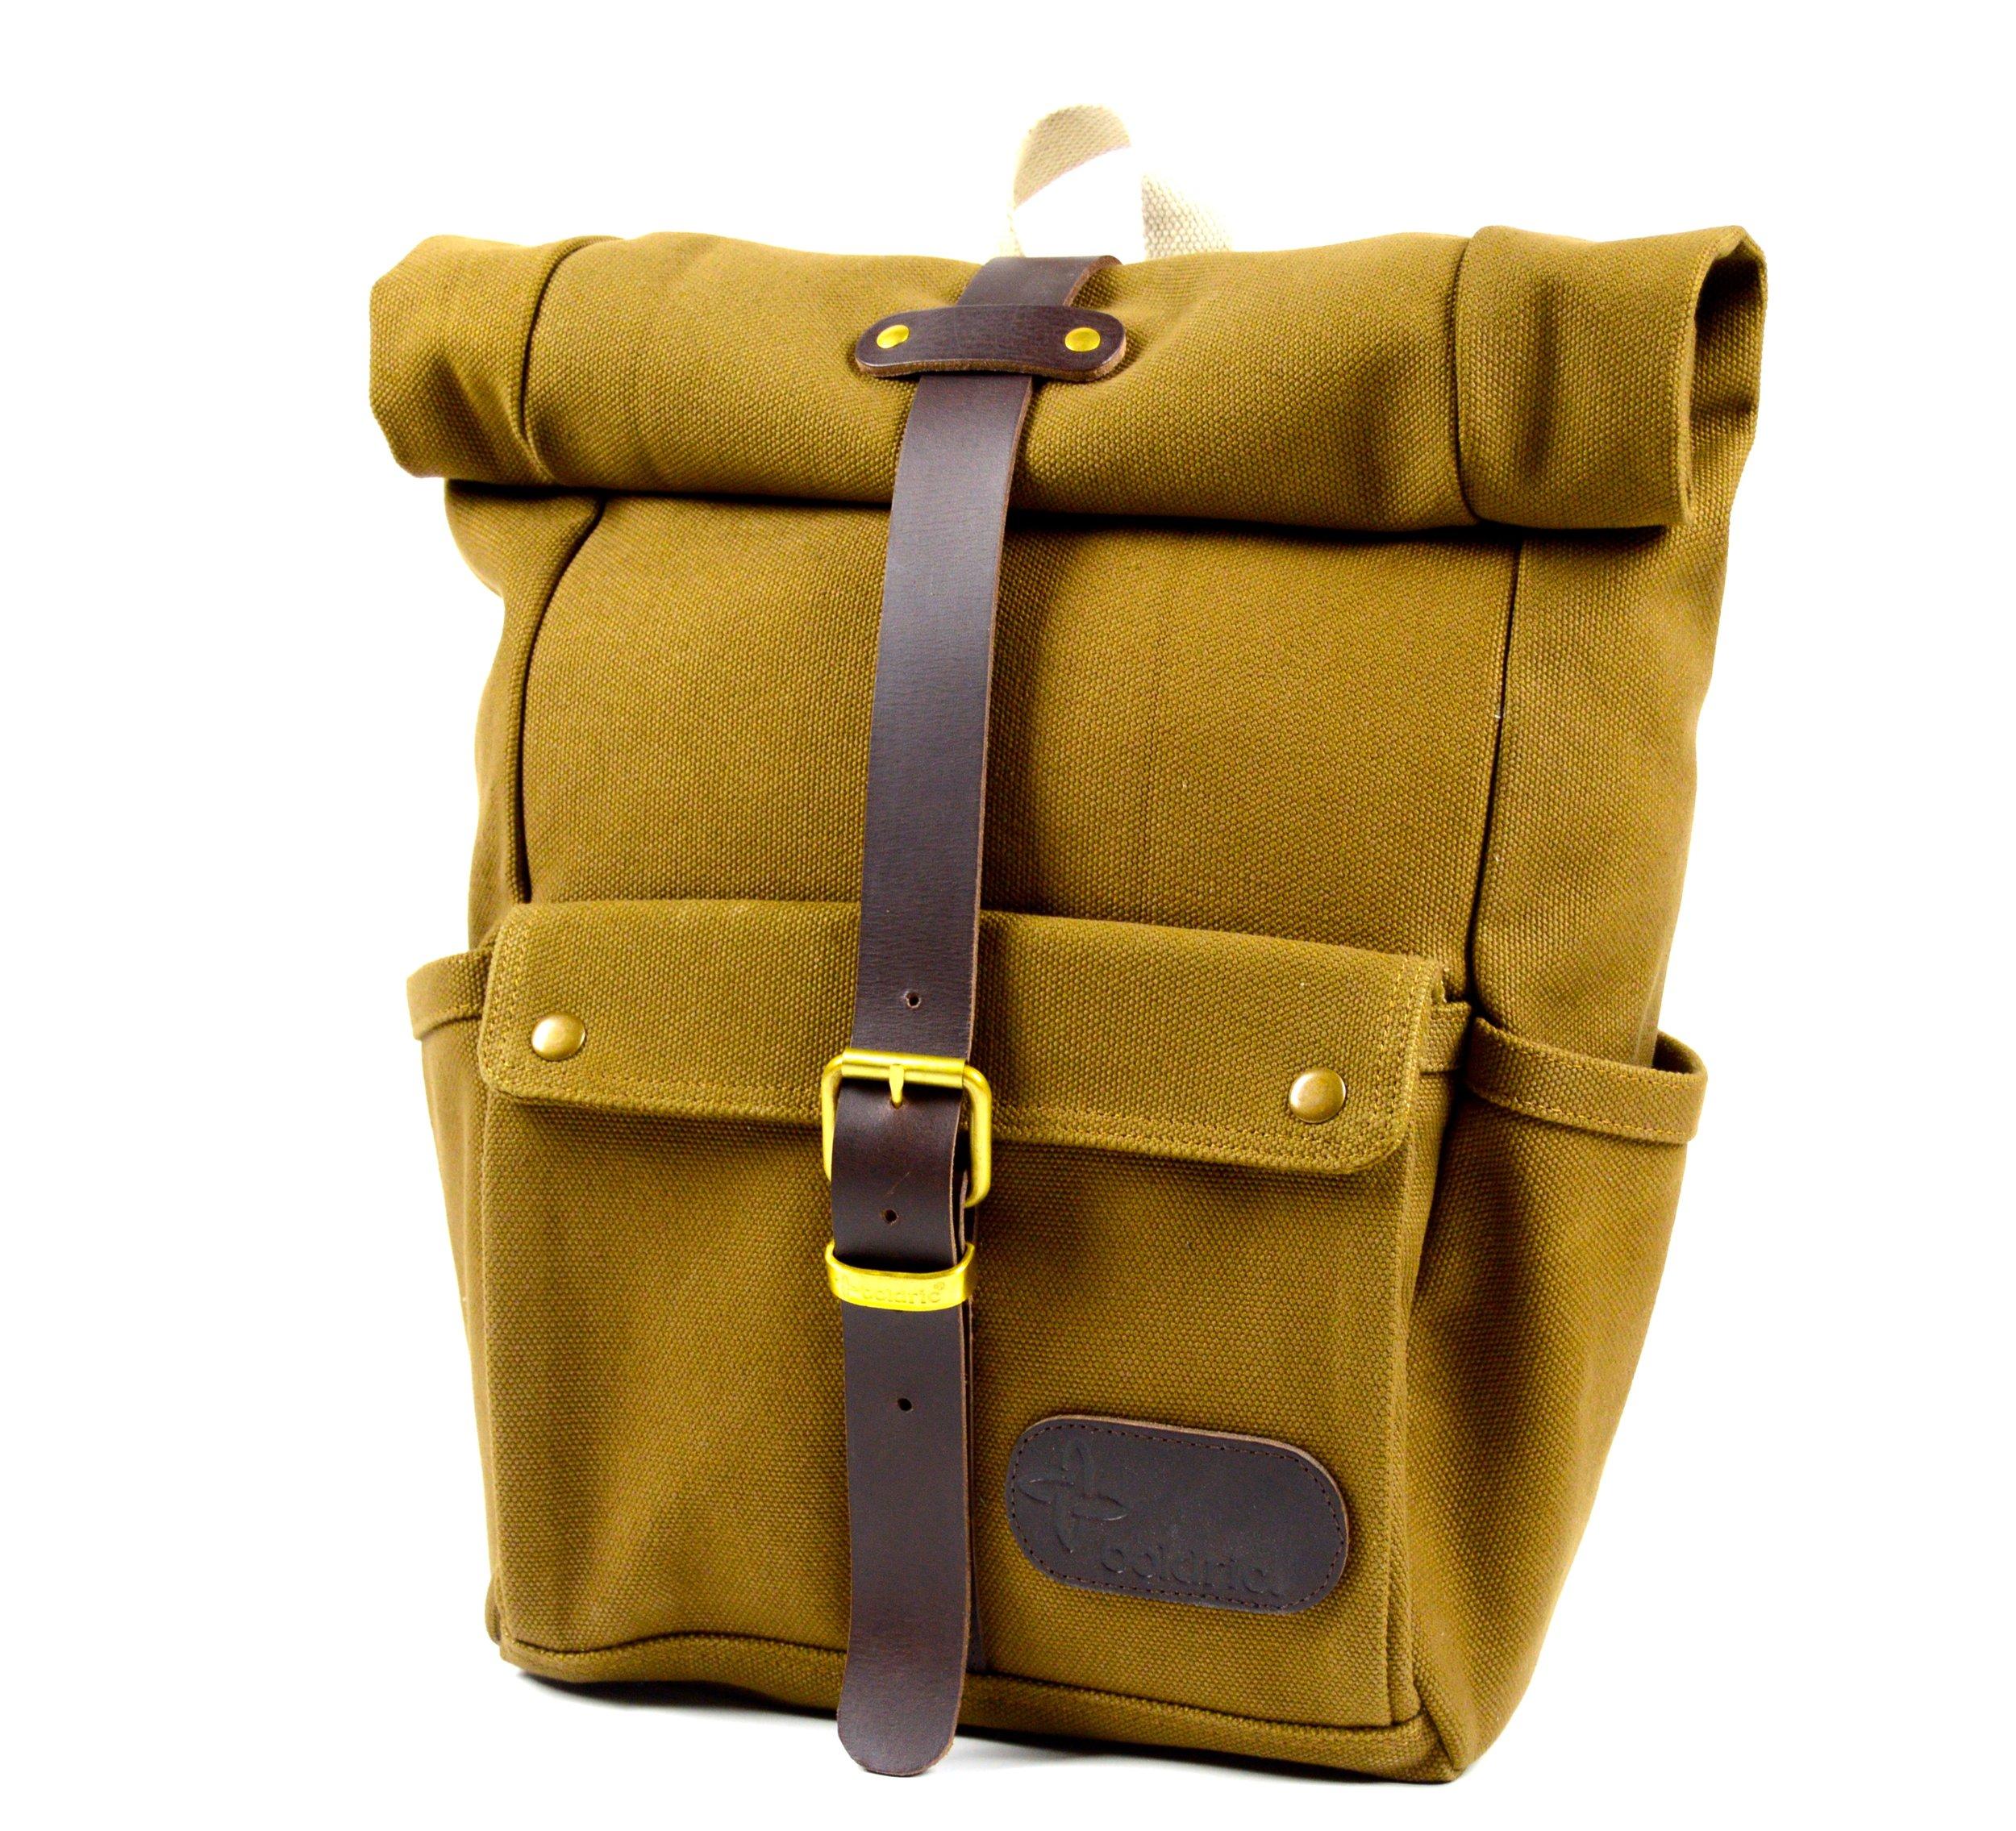 Handmade Bags Signature Backpack Boldric Knife Rolls Chef Coats Chef Knife Bags Aprons Chef Apparel